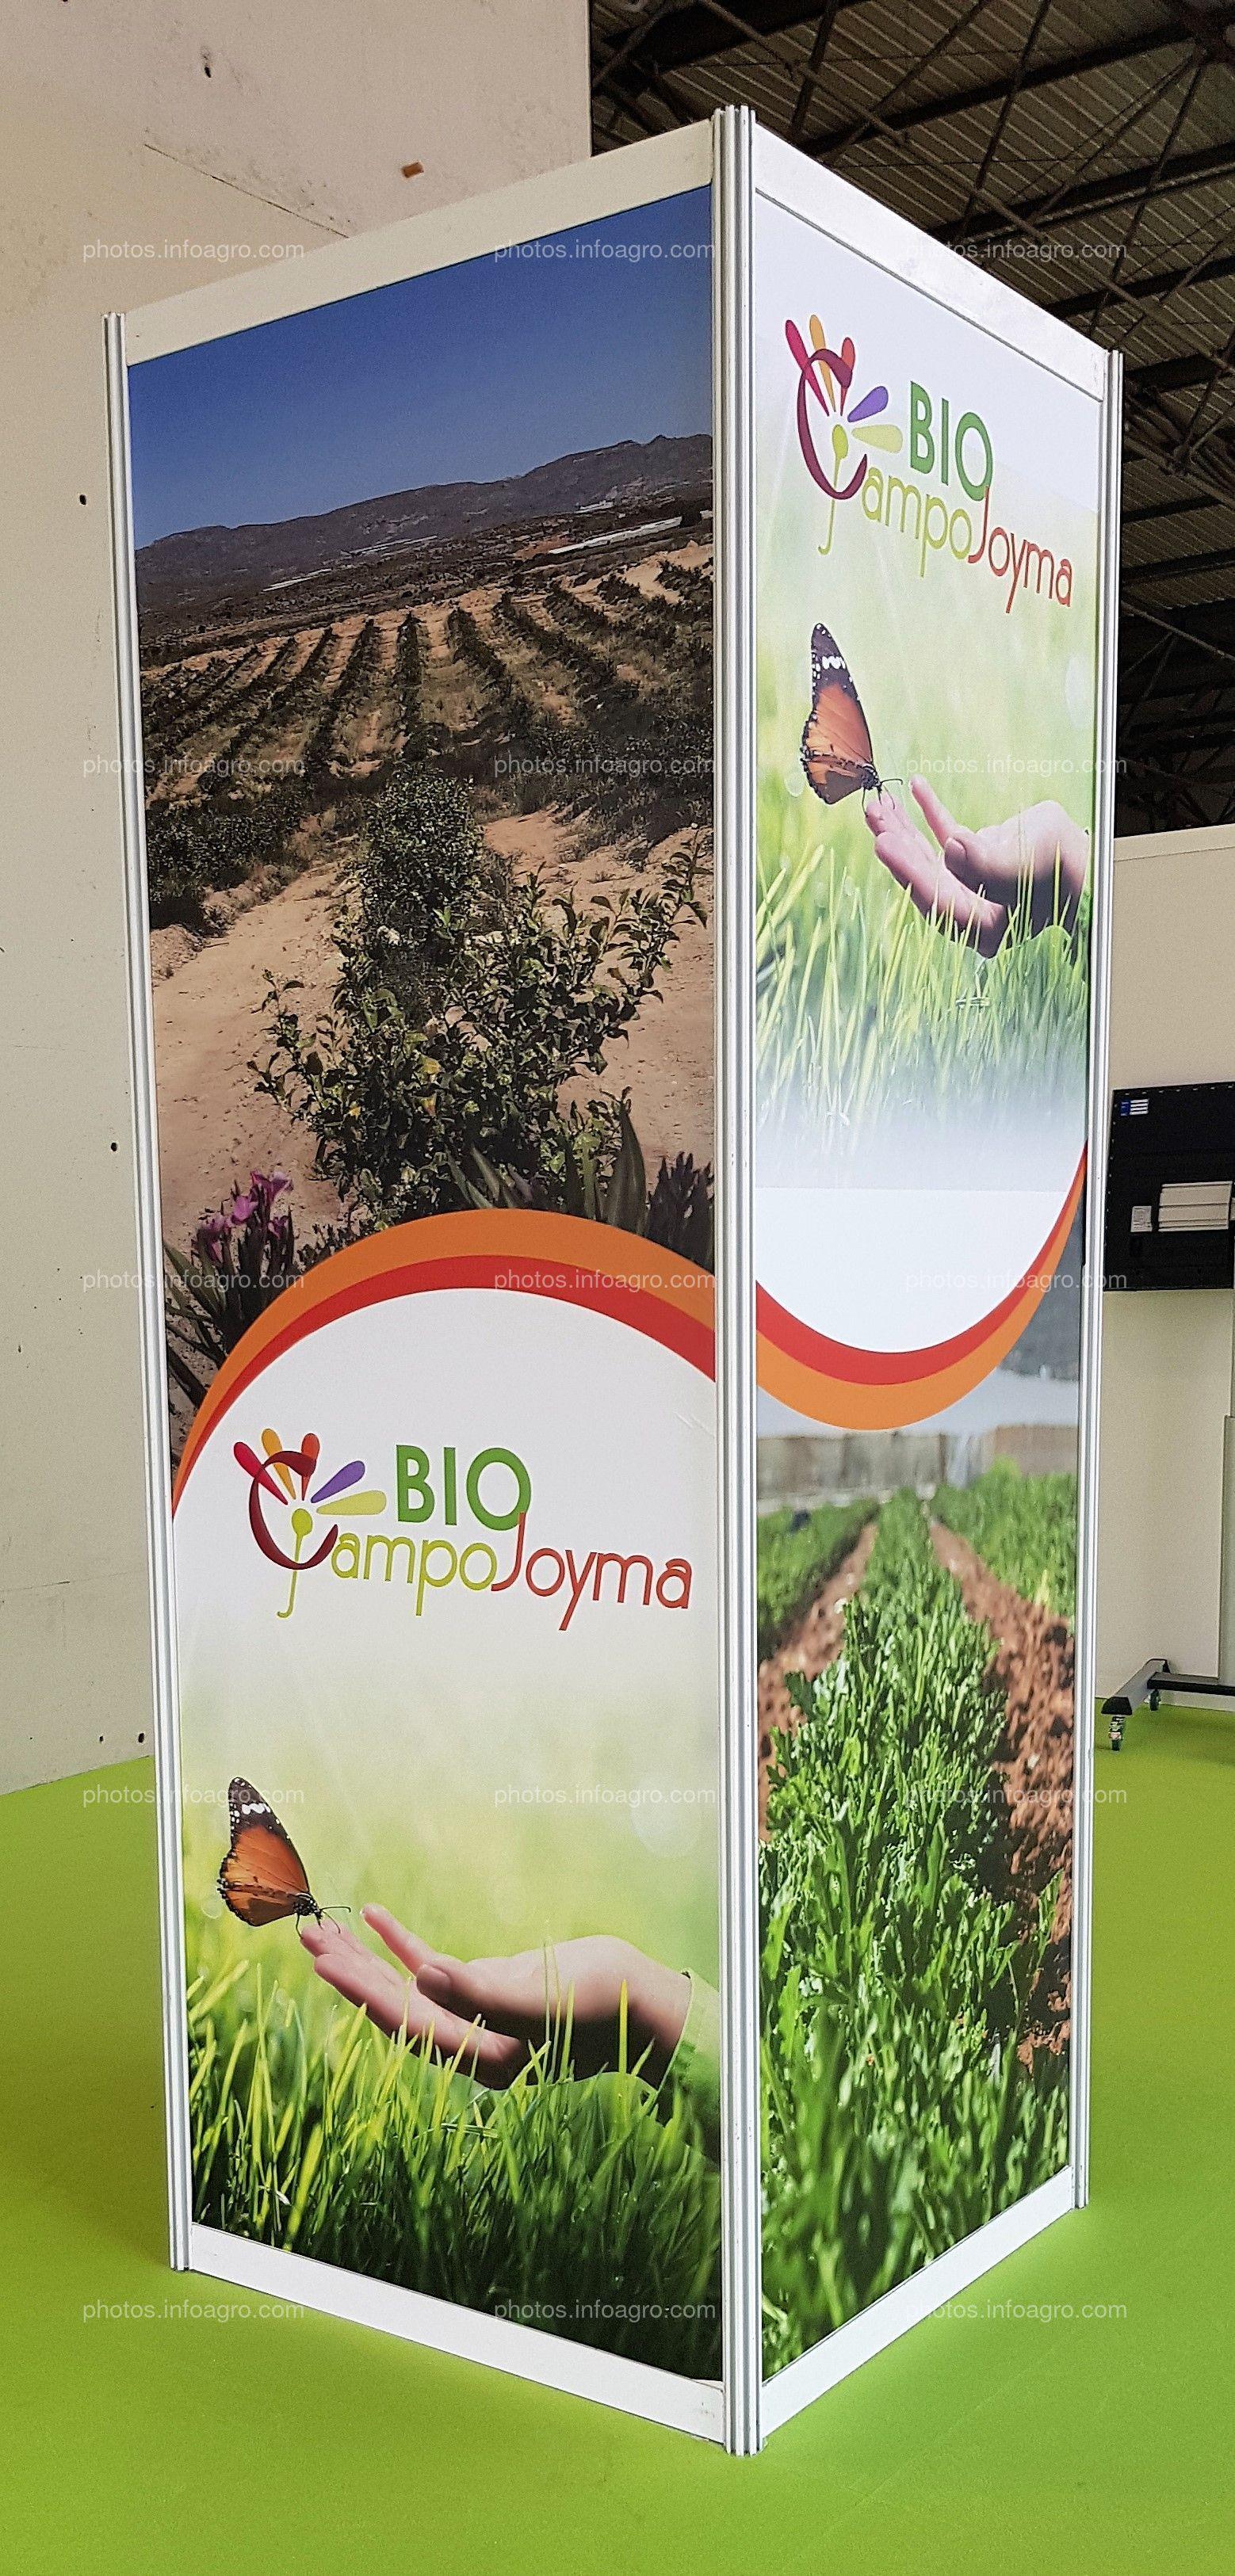 Bio CampoJoyma. Prisma columna. Espacio publicitario